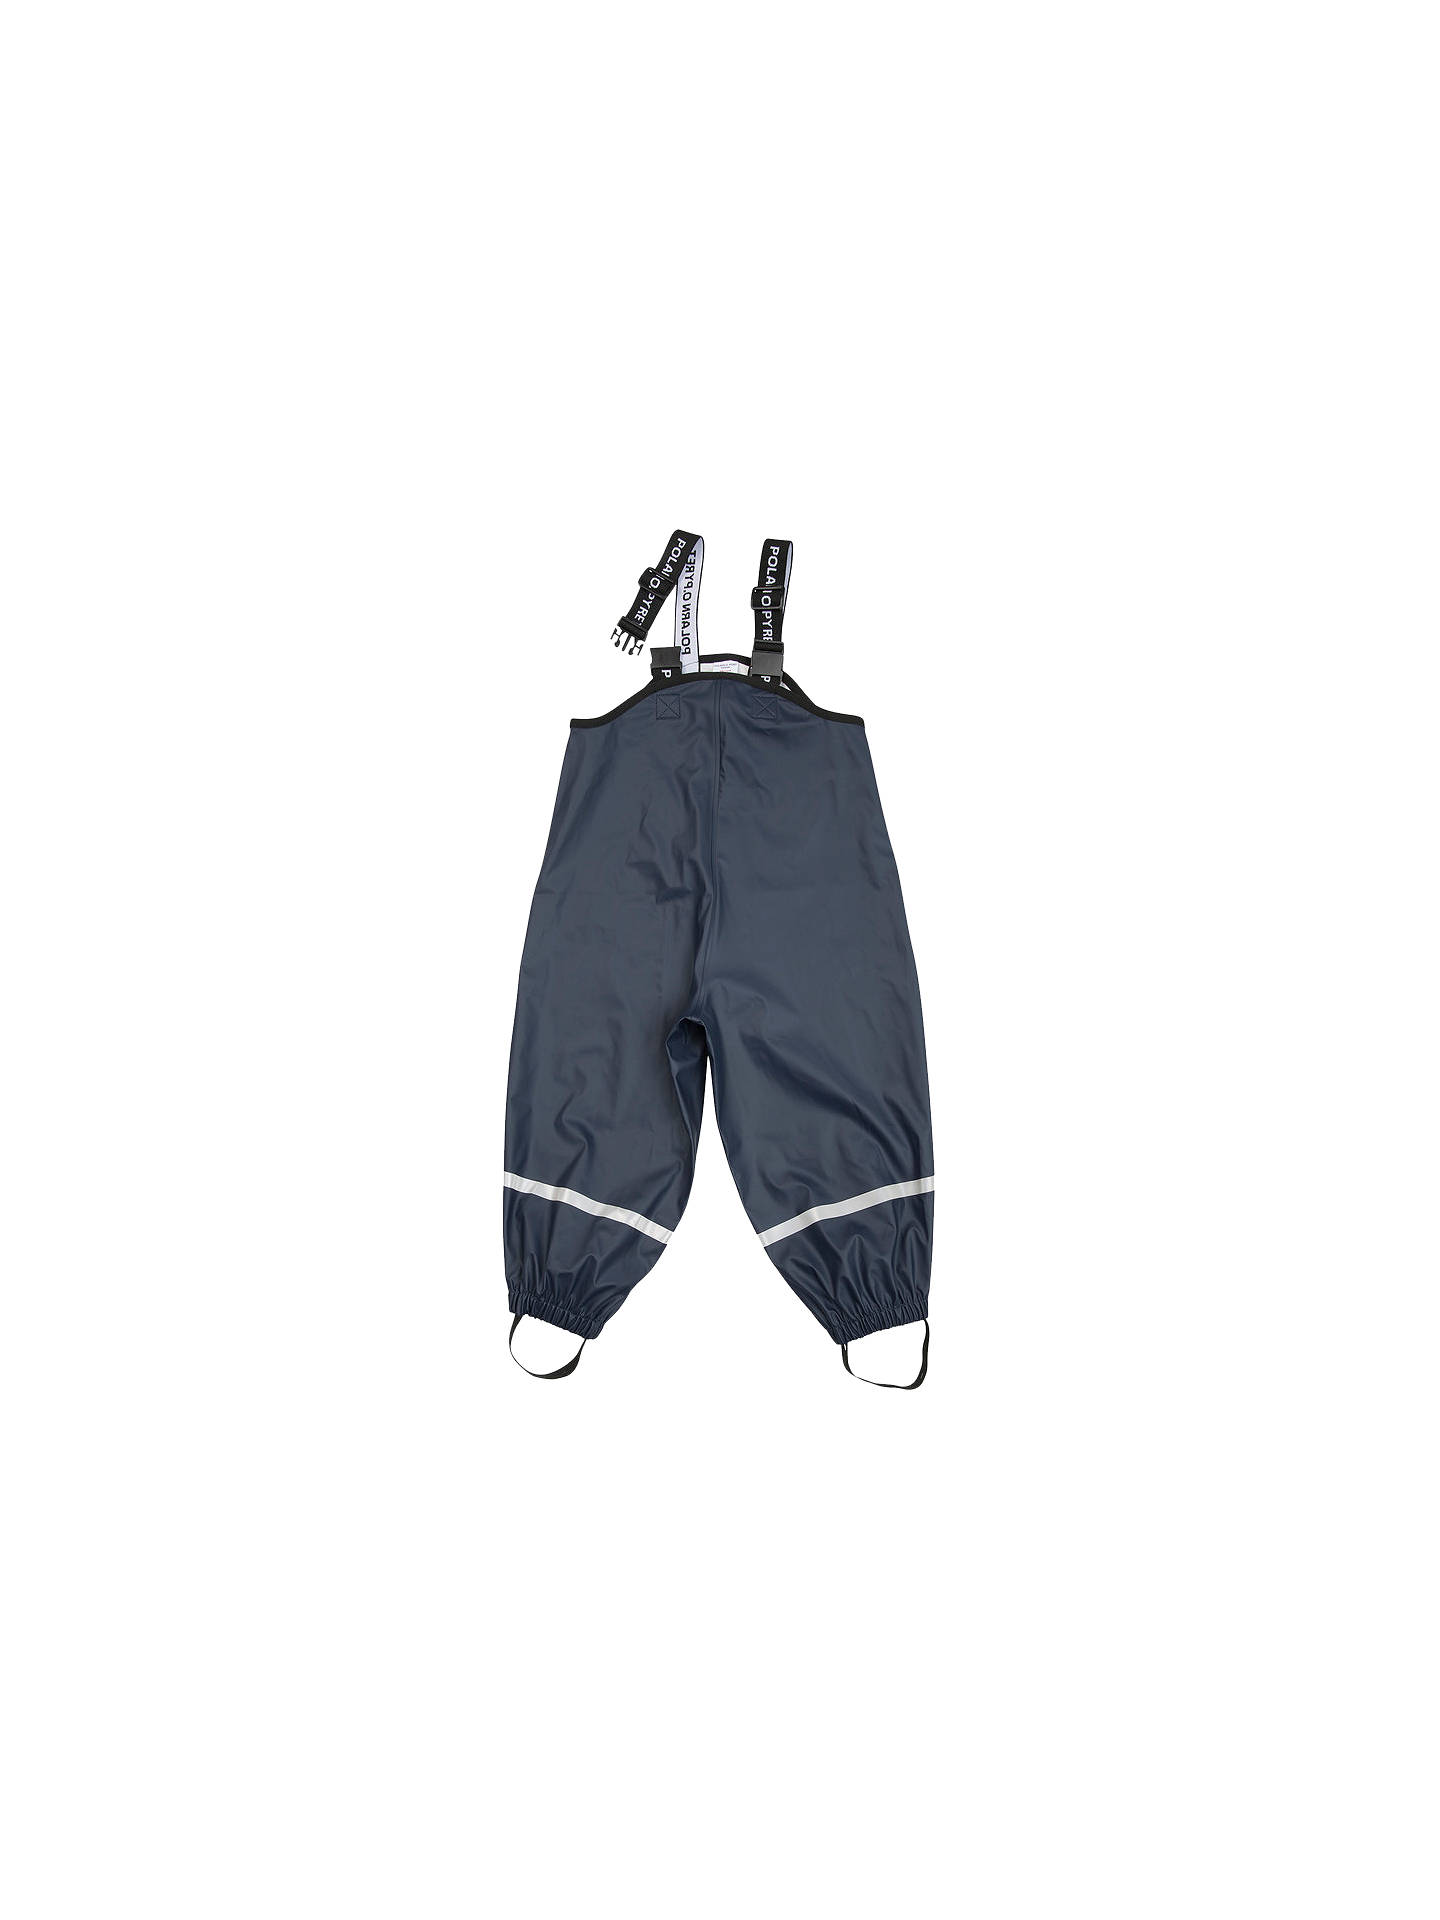 Polarn O Baby Pyret Waterproof RAIN Pants